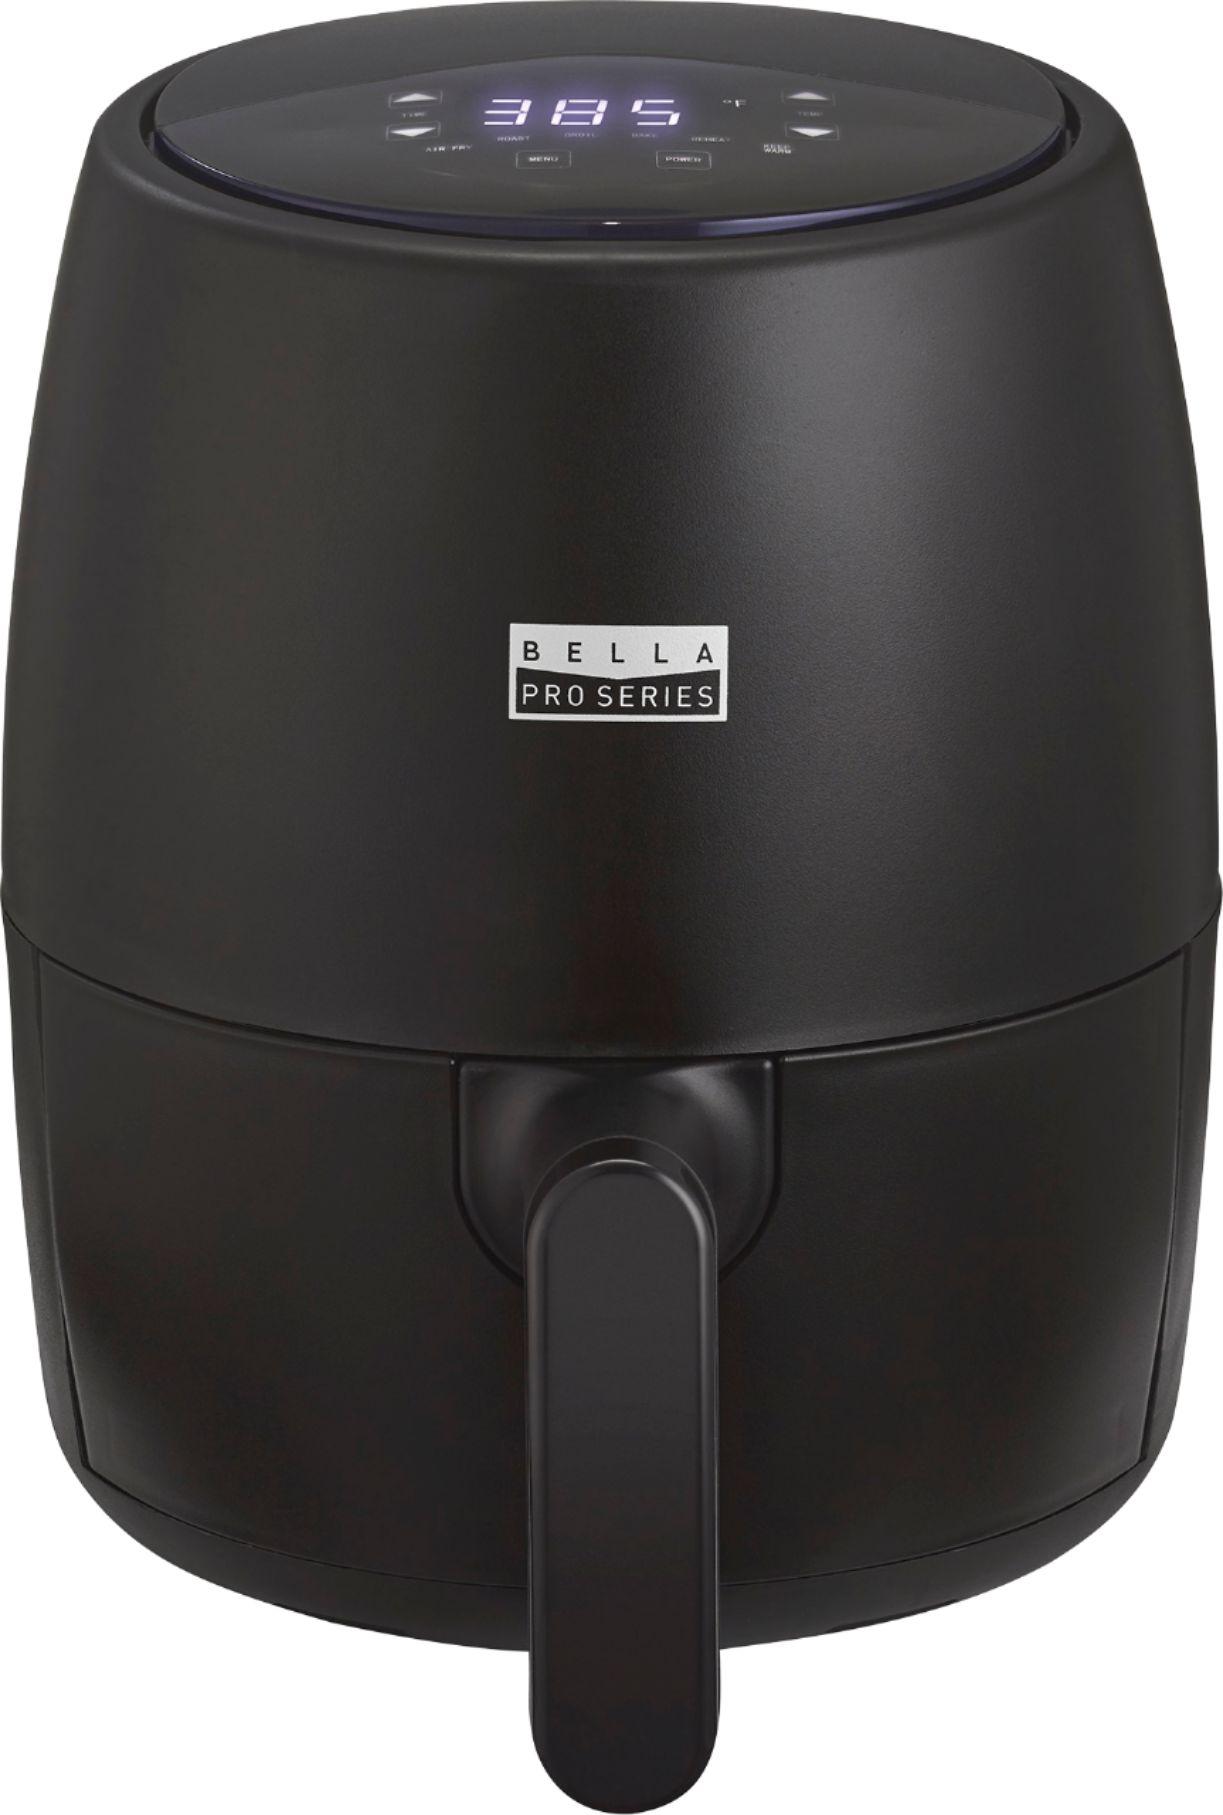 Bella Pro Series - 2-qt. Touchscreen Air Fryer - Black Matte, $19.99, free store pickup, Best Buy